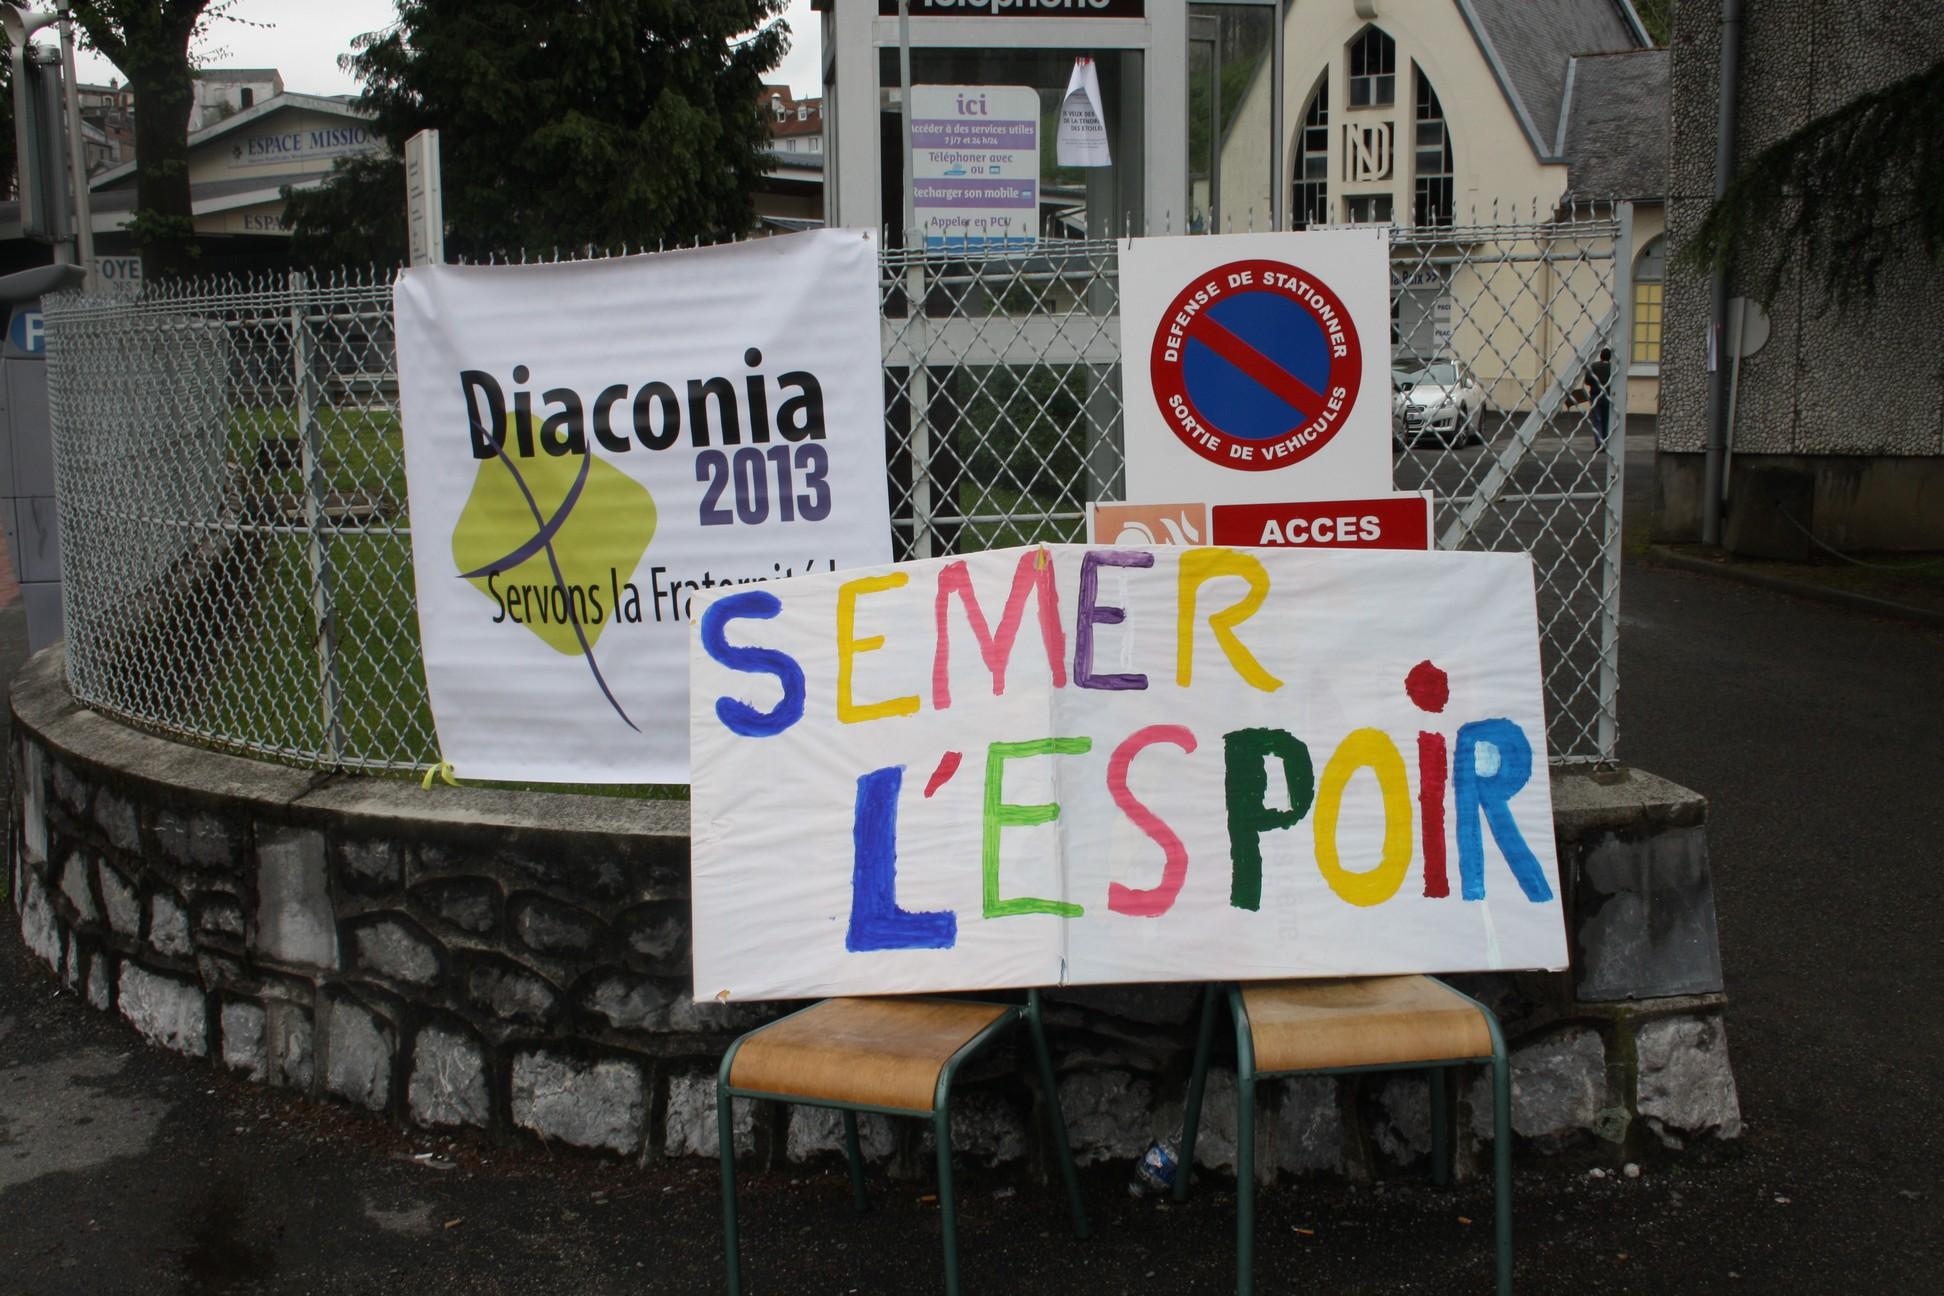 Diaconia 2013 - Semer l'espoir